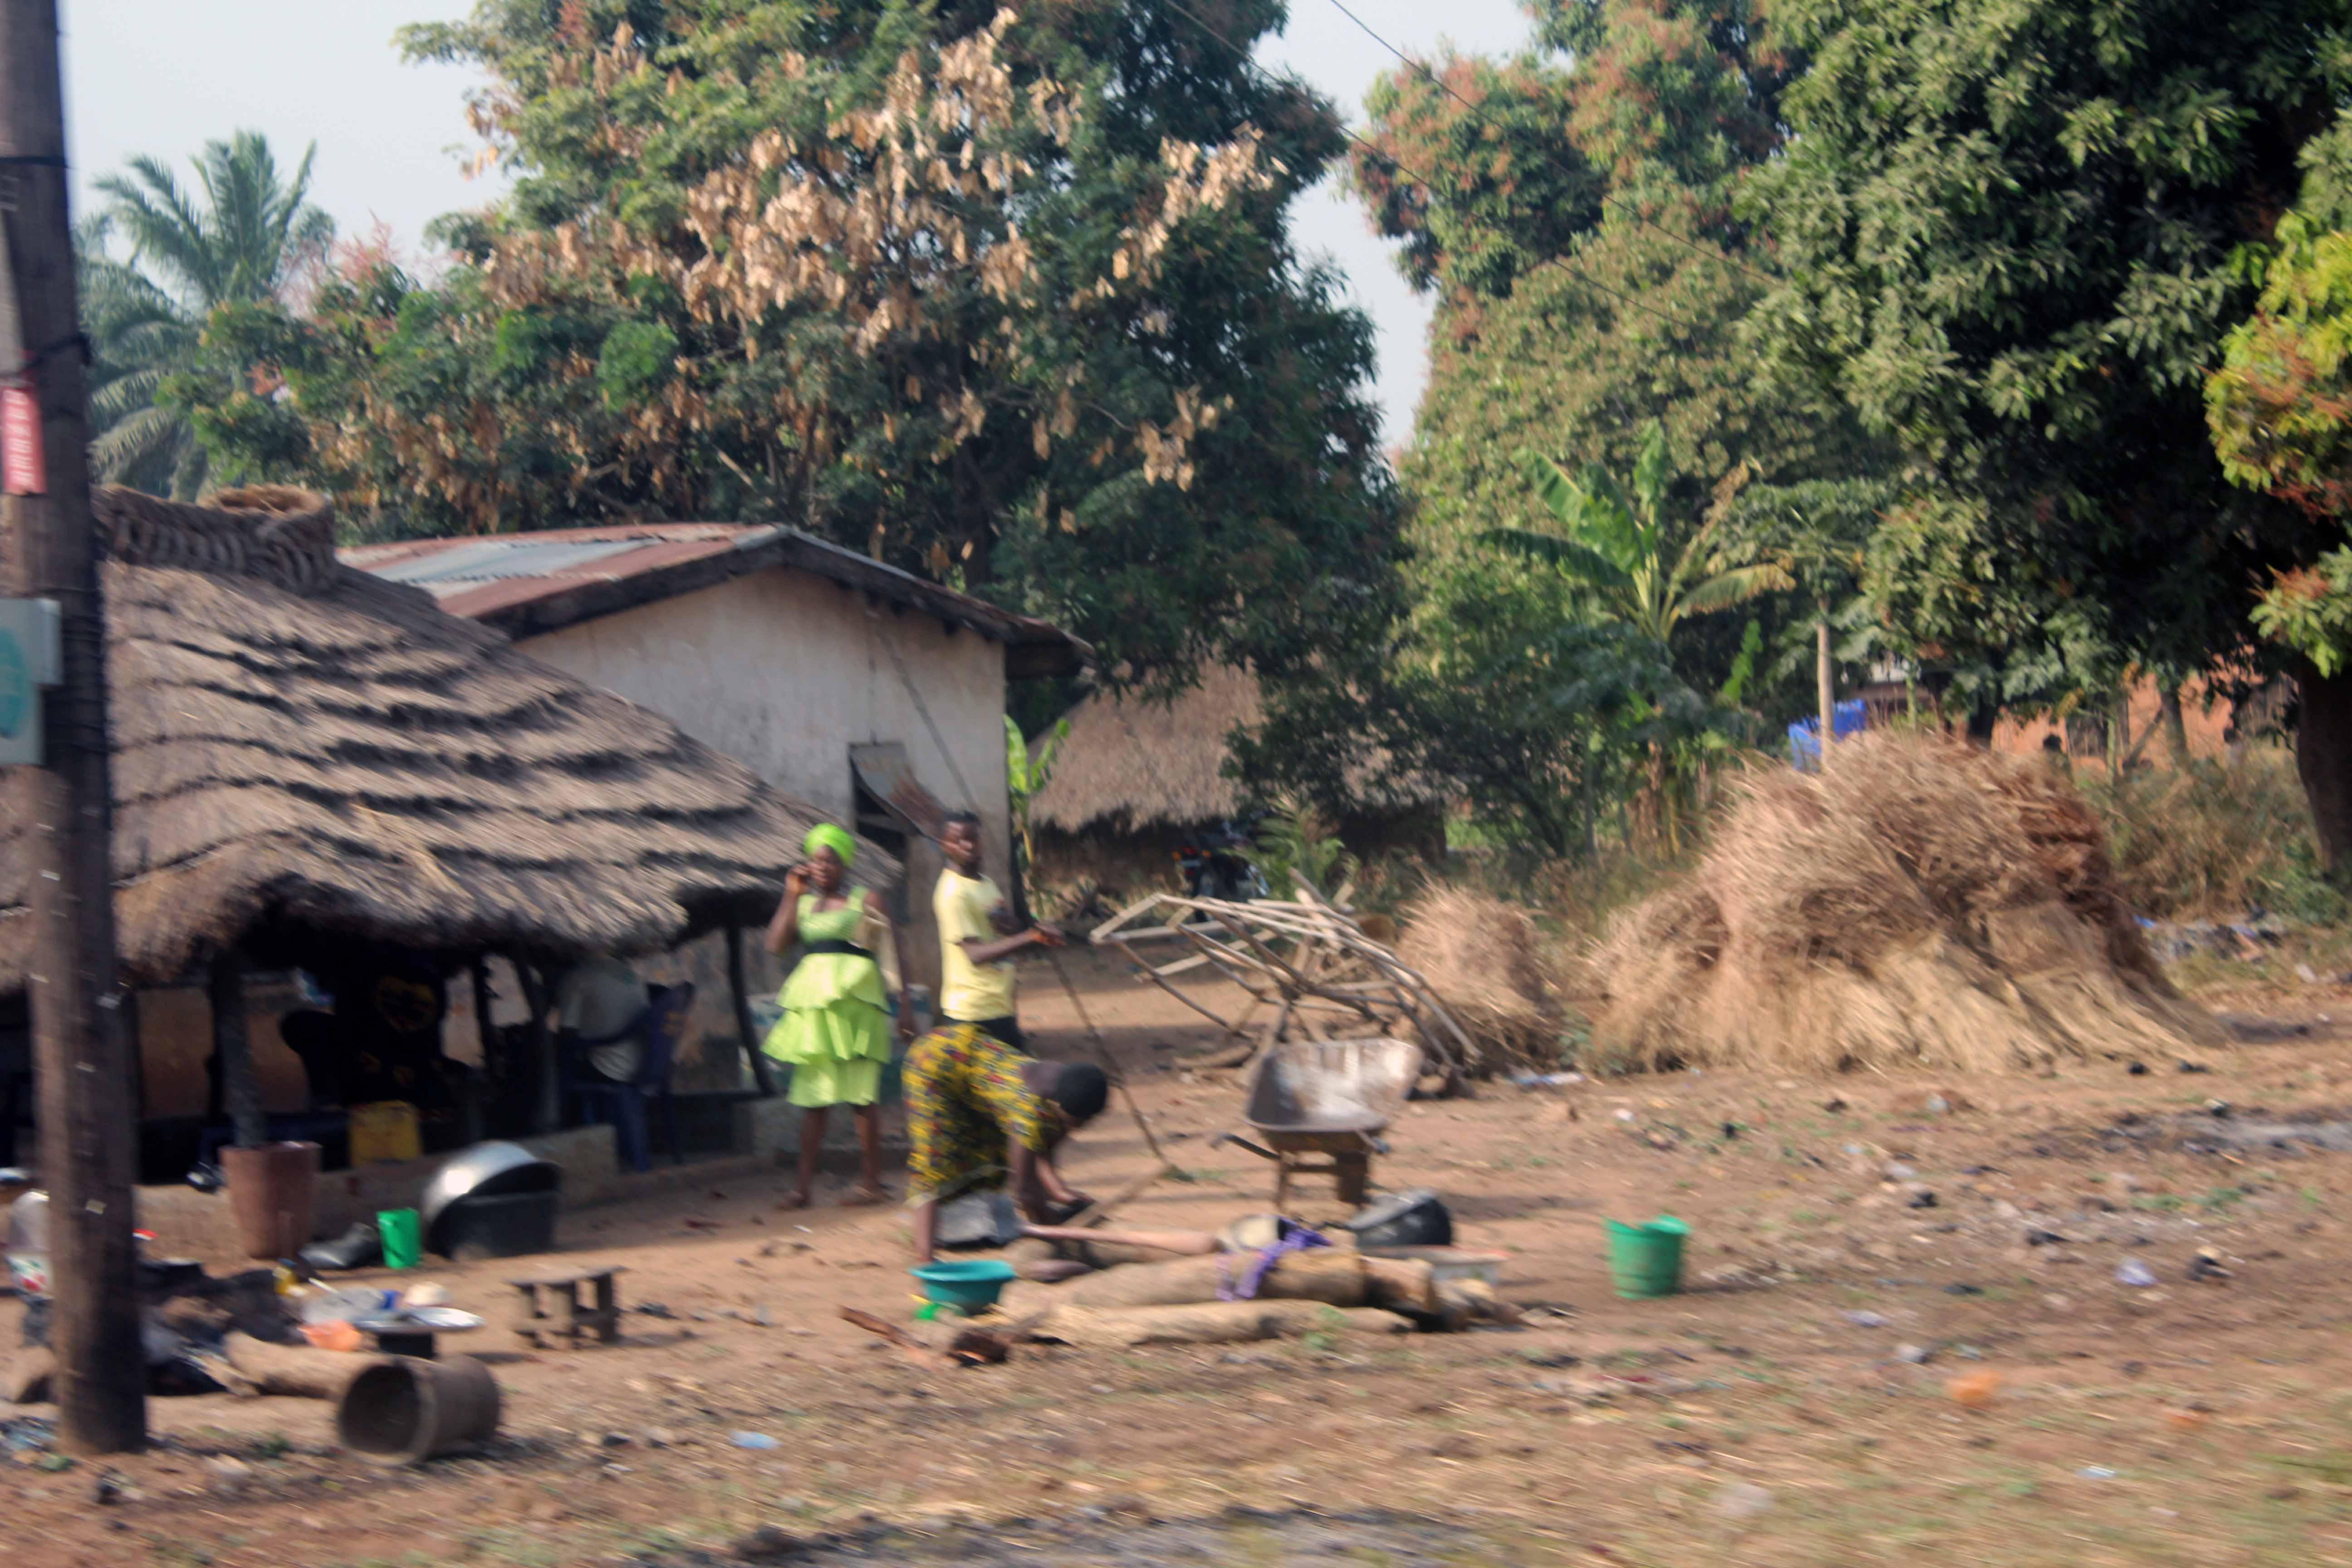 Kpoko Village Benue Nigeria